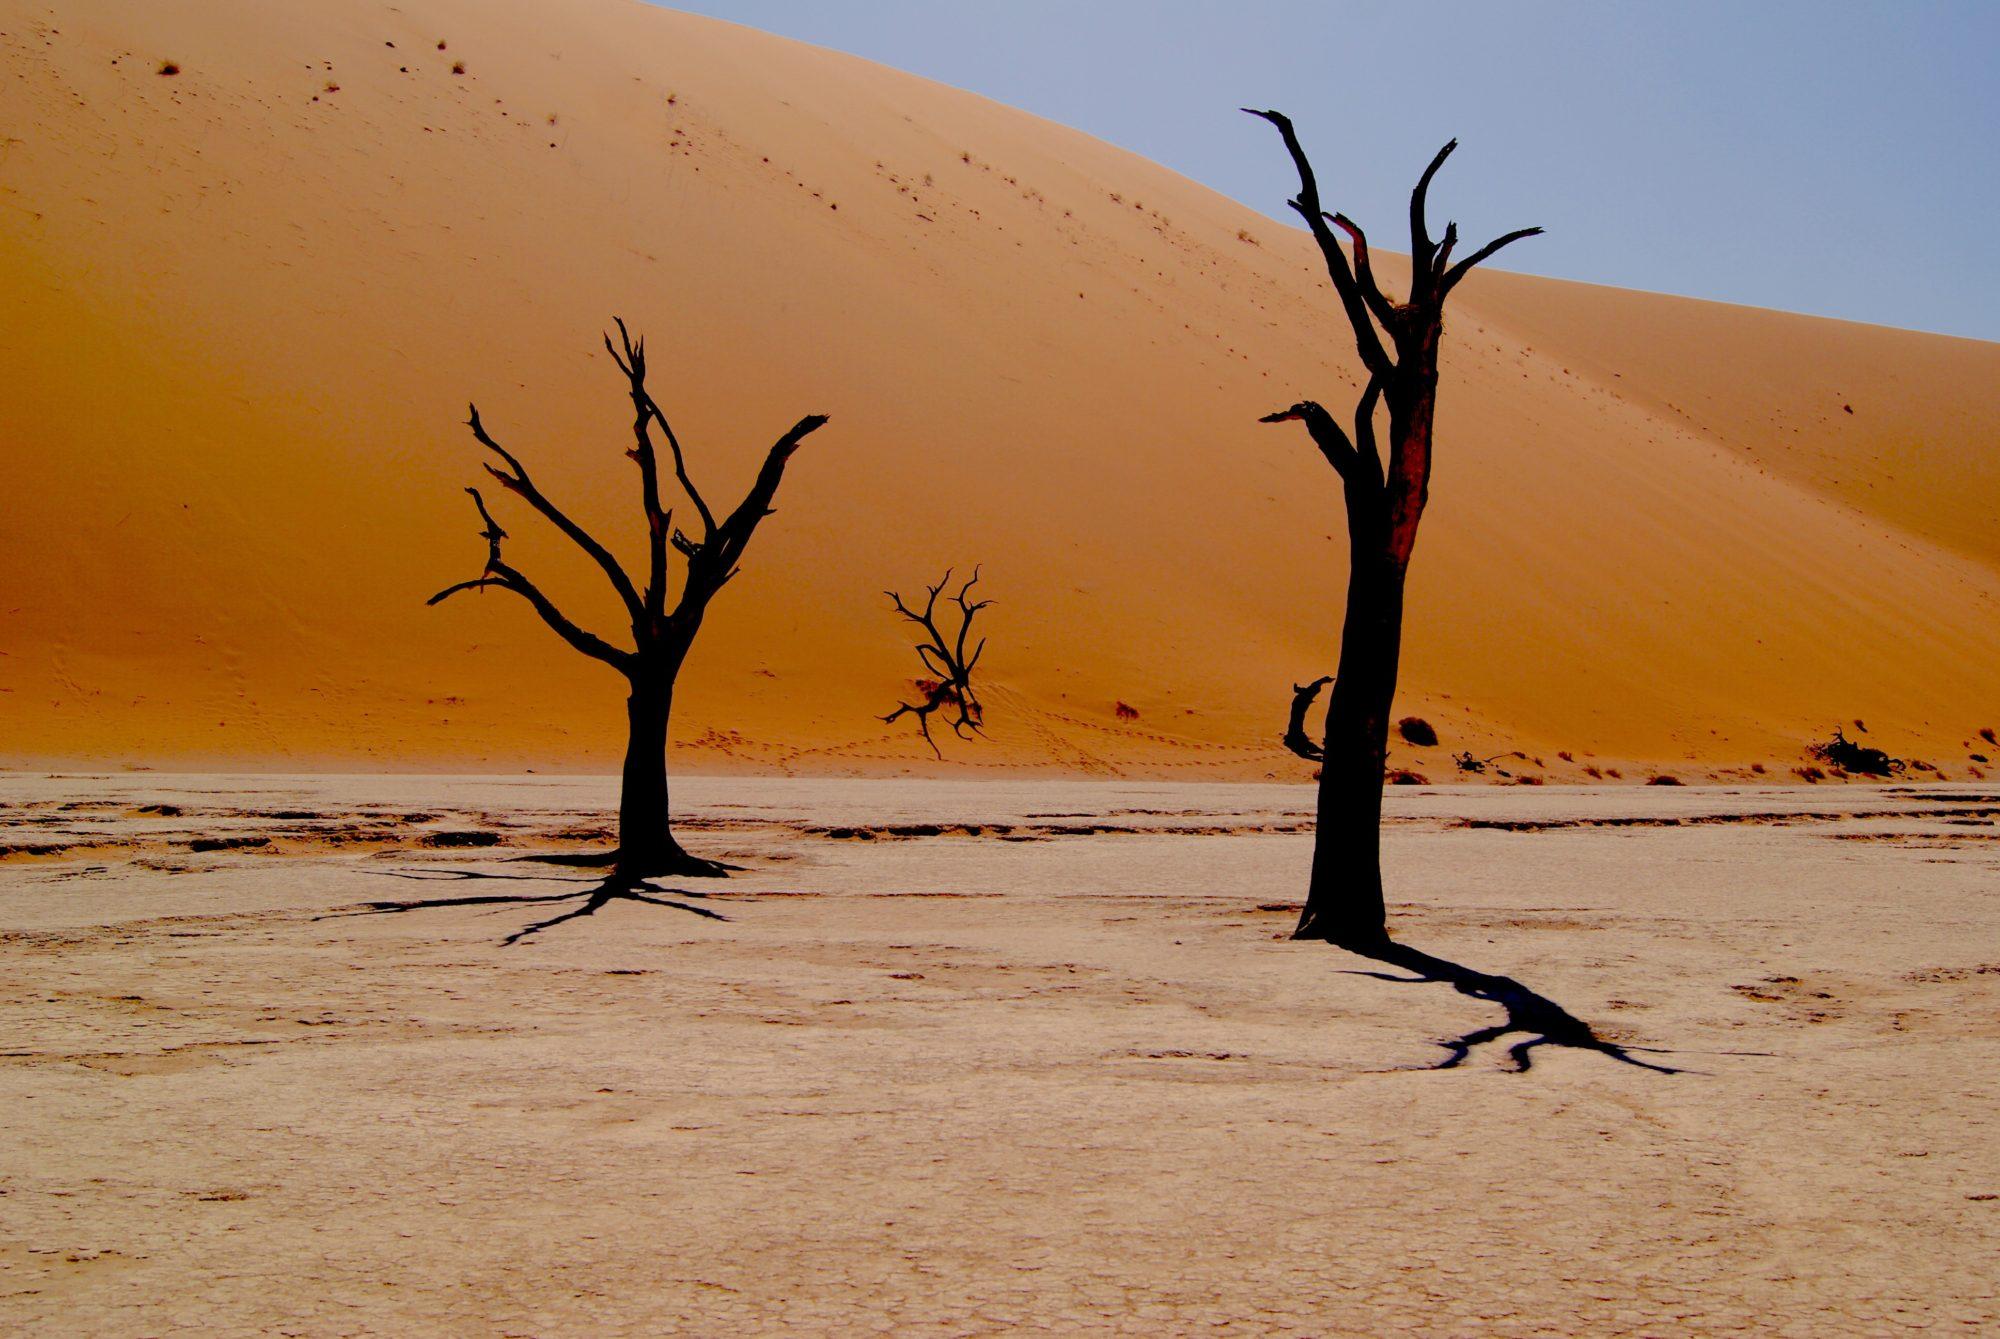 Dry Thirsty Land